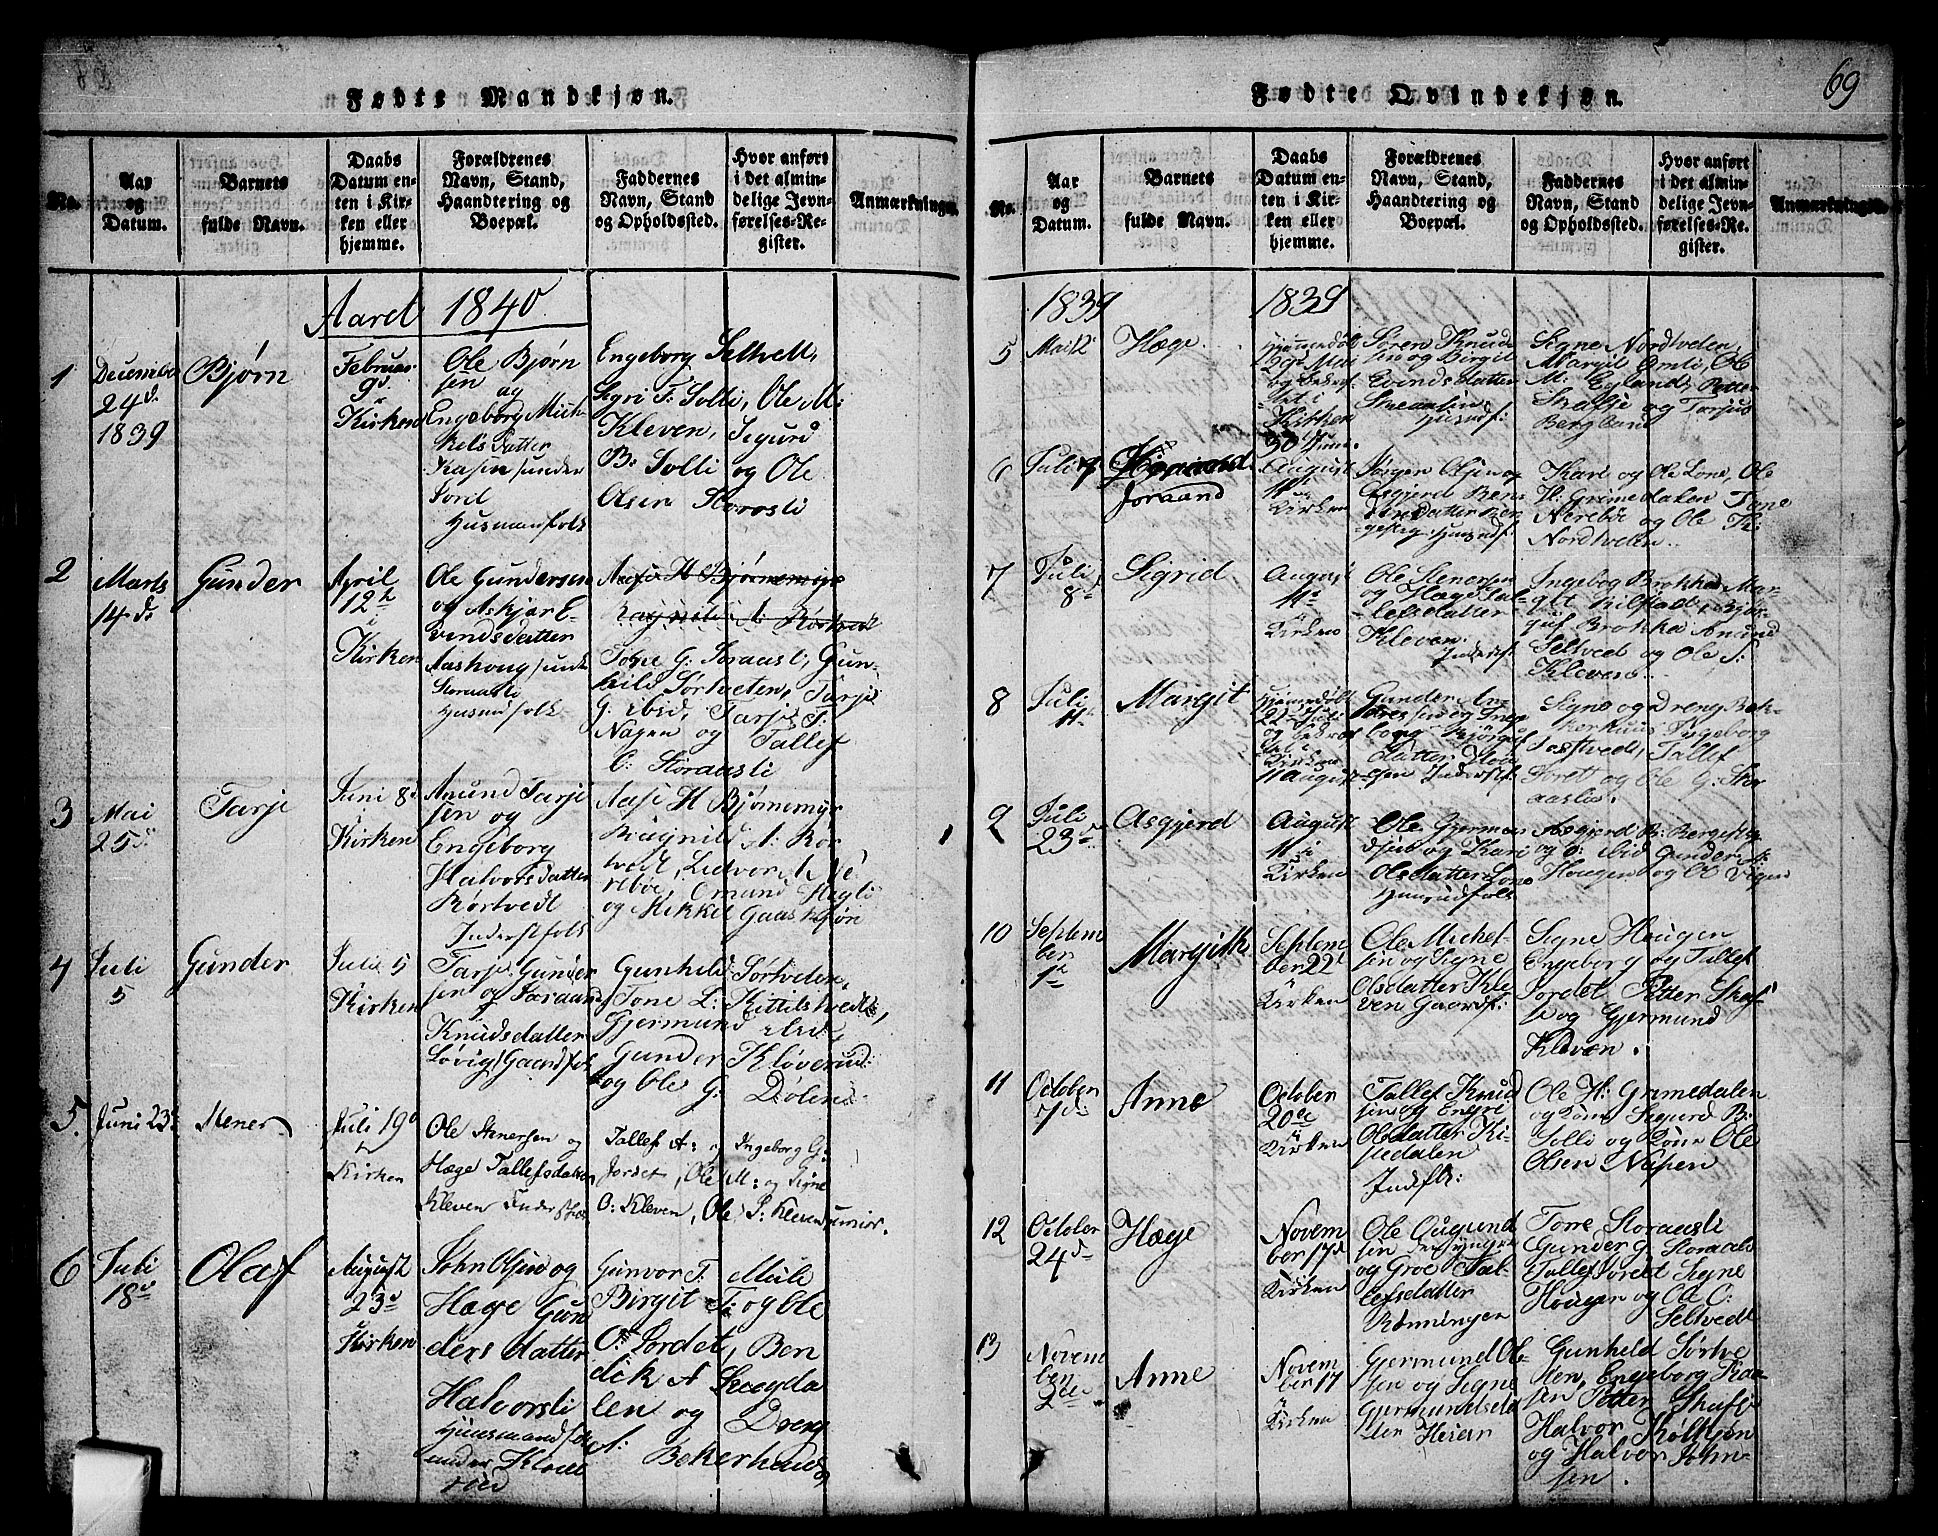 SAKO, Mo kirkebøker, G/Gb/L0001: Klokkerbok nr. II 1, 1814-1843, s. 69